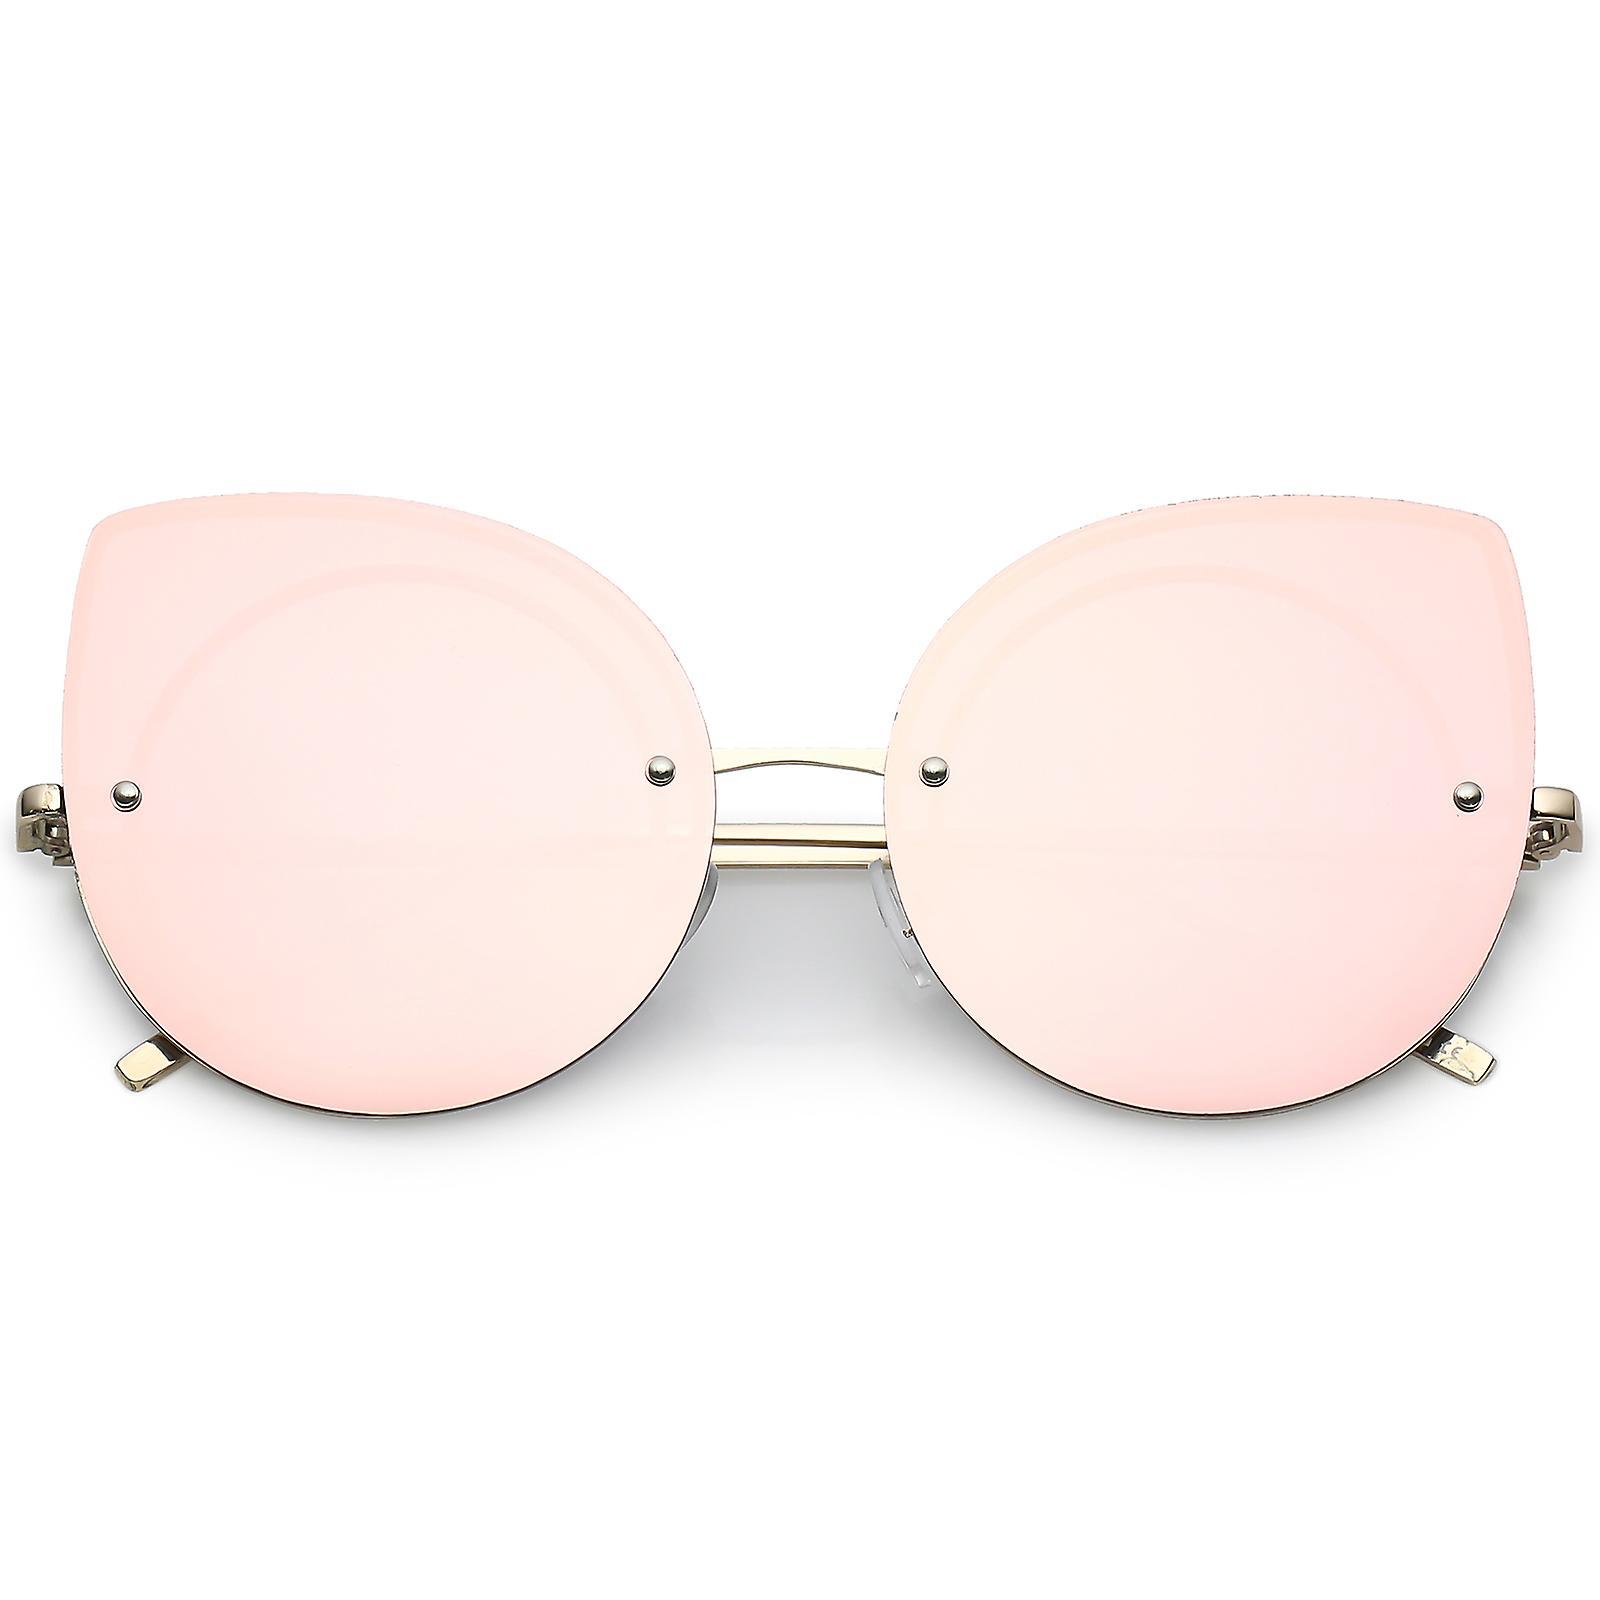 Ultra With Arms Slim Mirrored Lens Oversize Eye 64mm Sunglasses Rimless Cat Flat TkiPXZuO